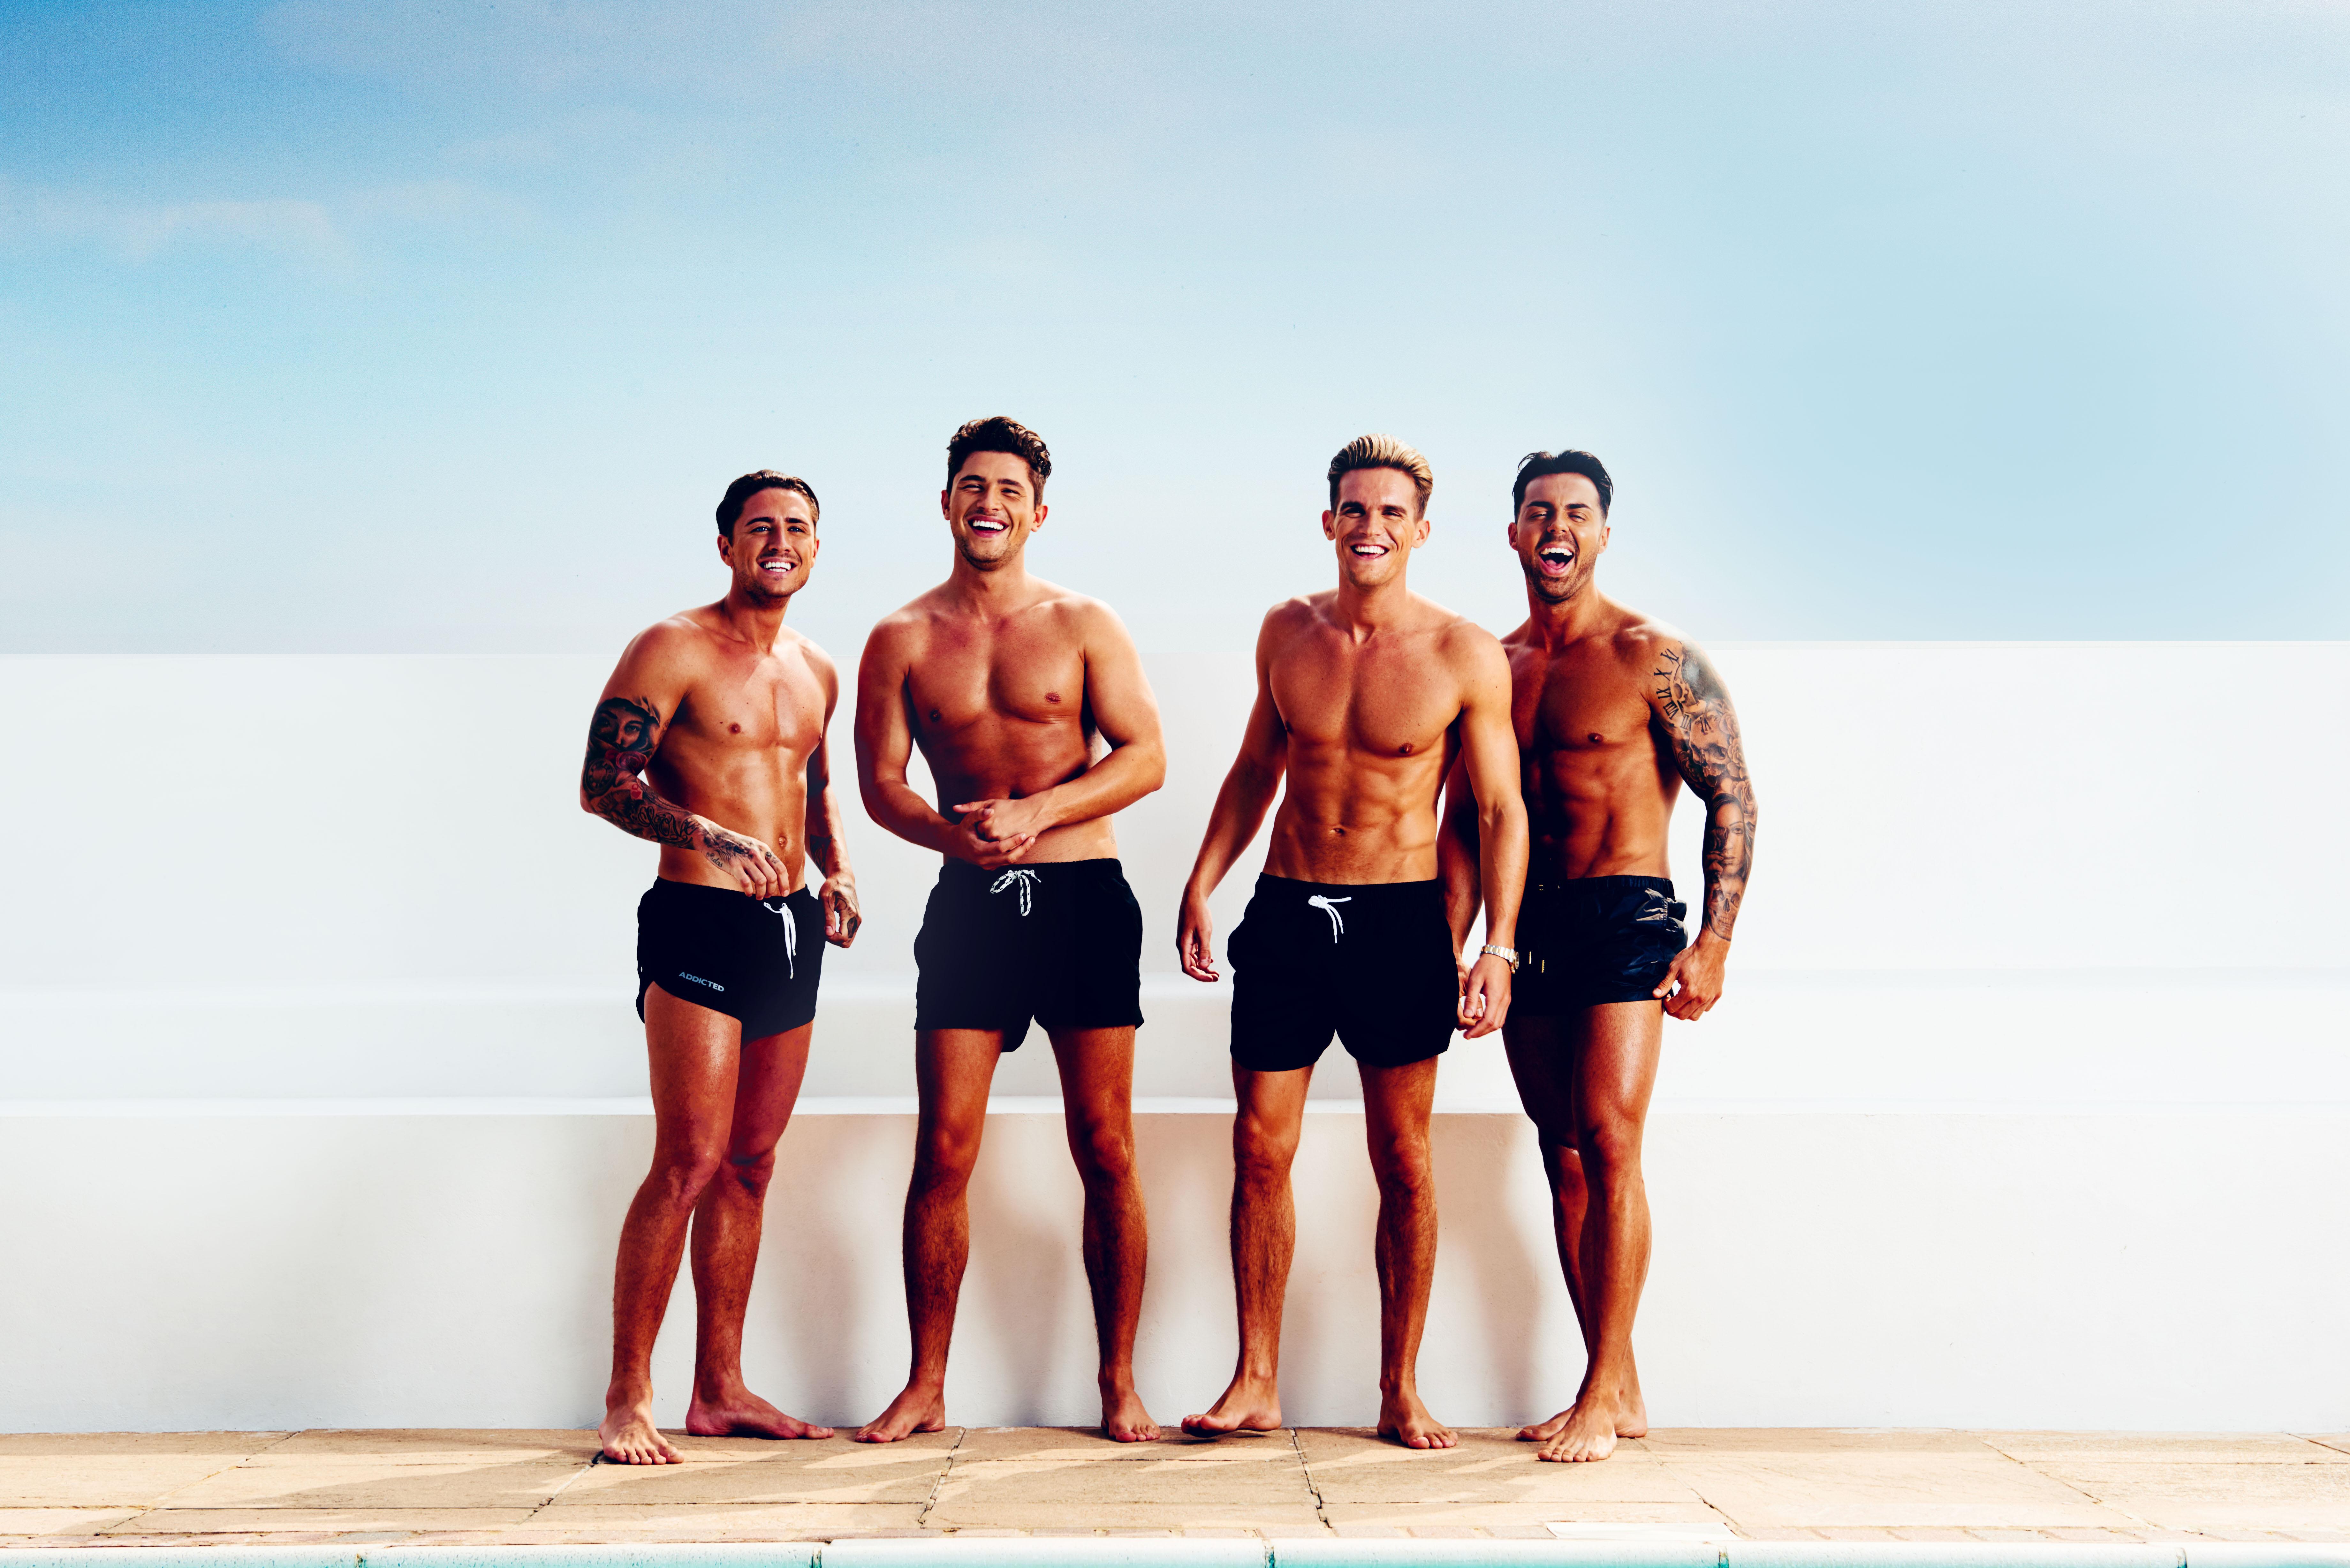 Nudeboys on the beach hentai pic